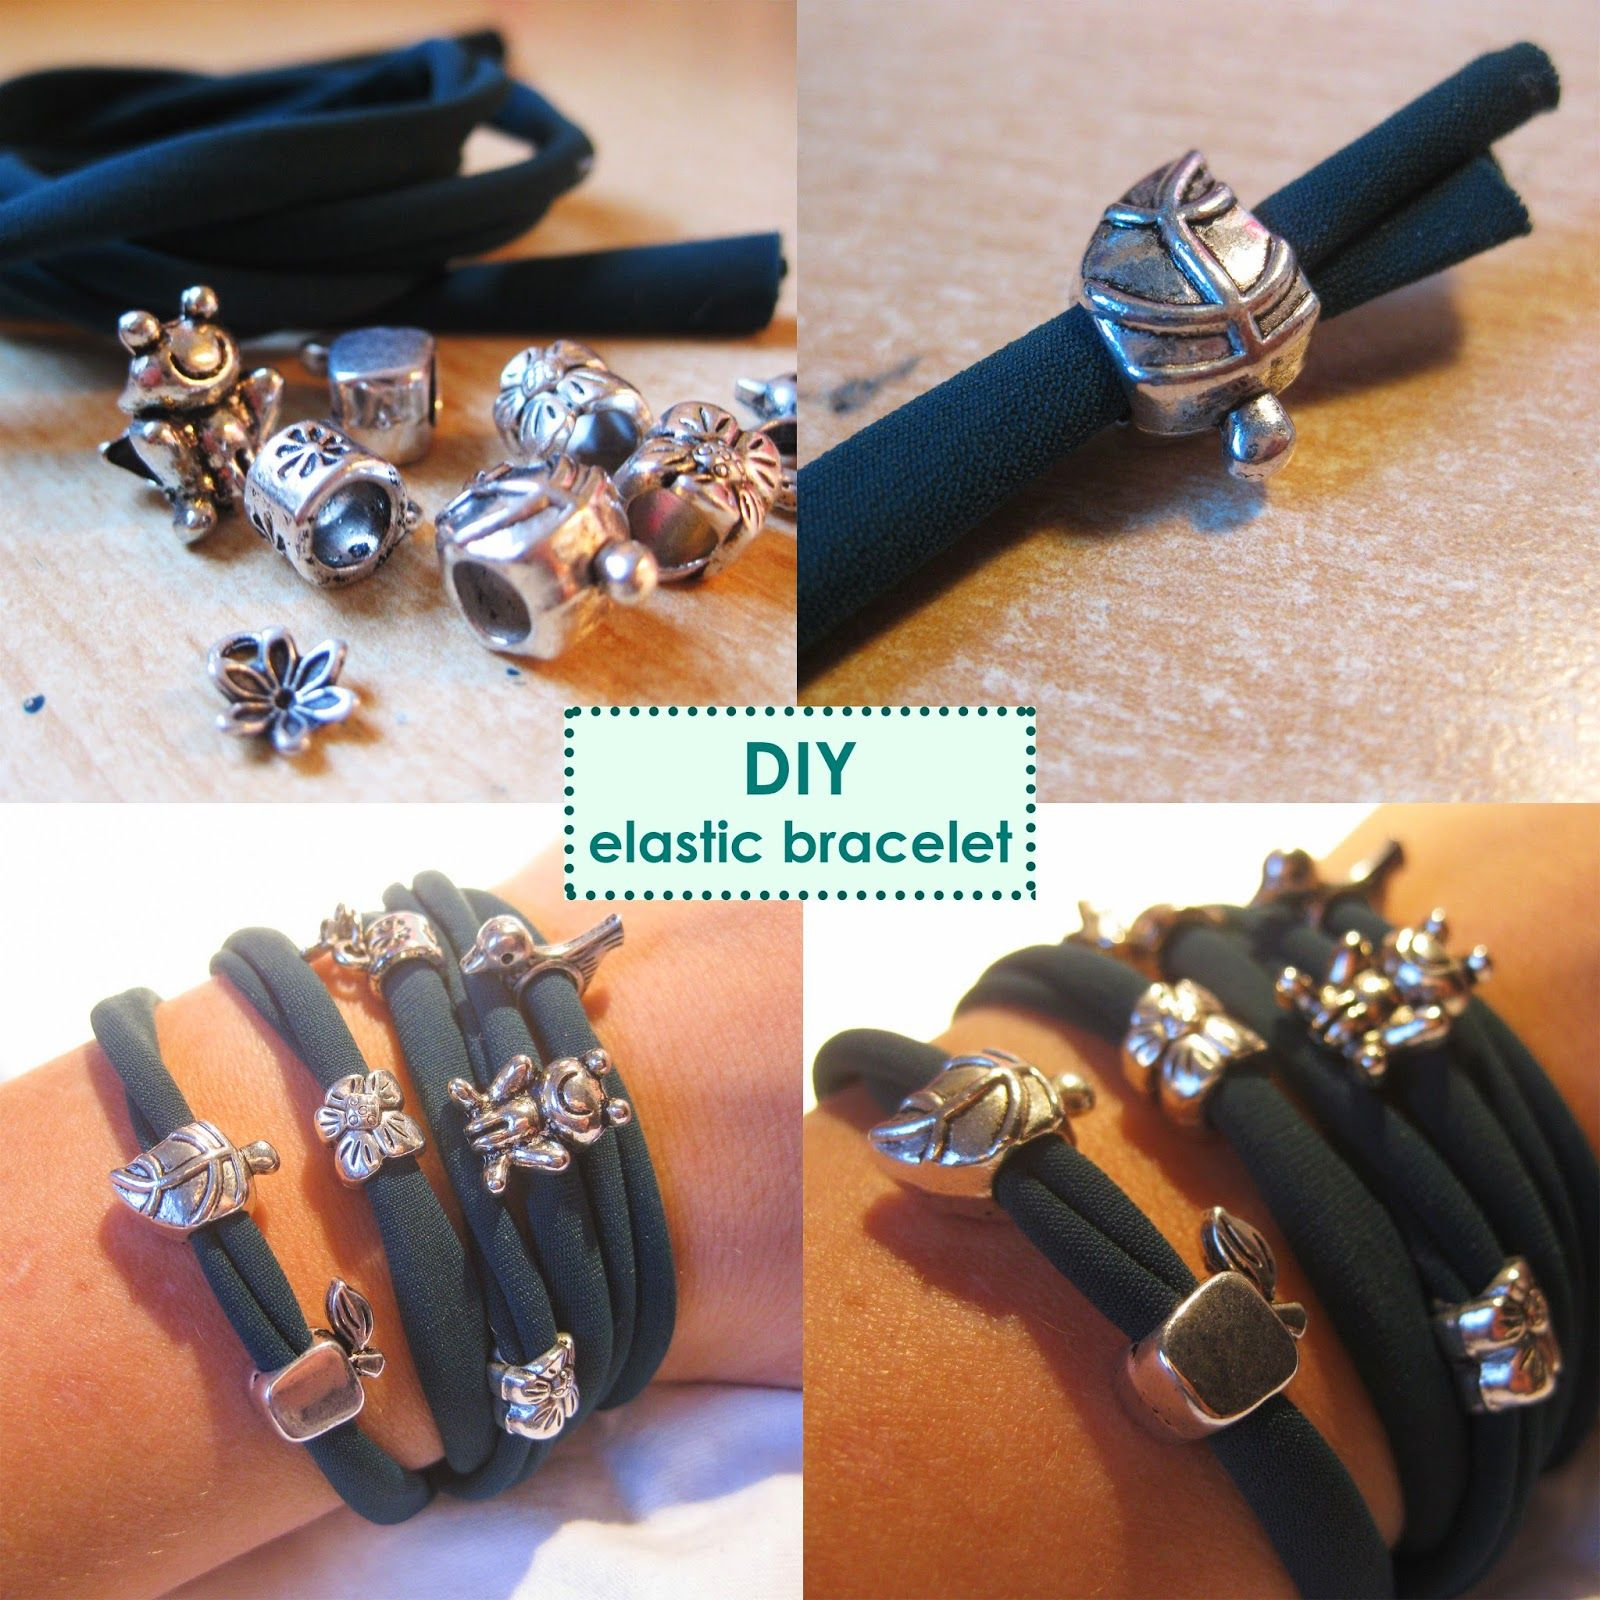 #diy #elastic #bracelets #tutorial #easy #quick # gift idea #handmade